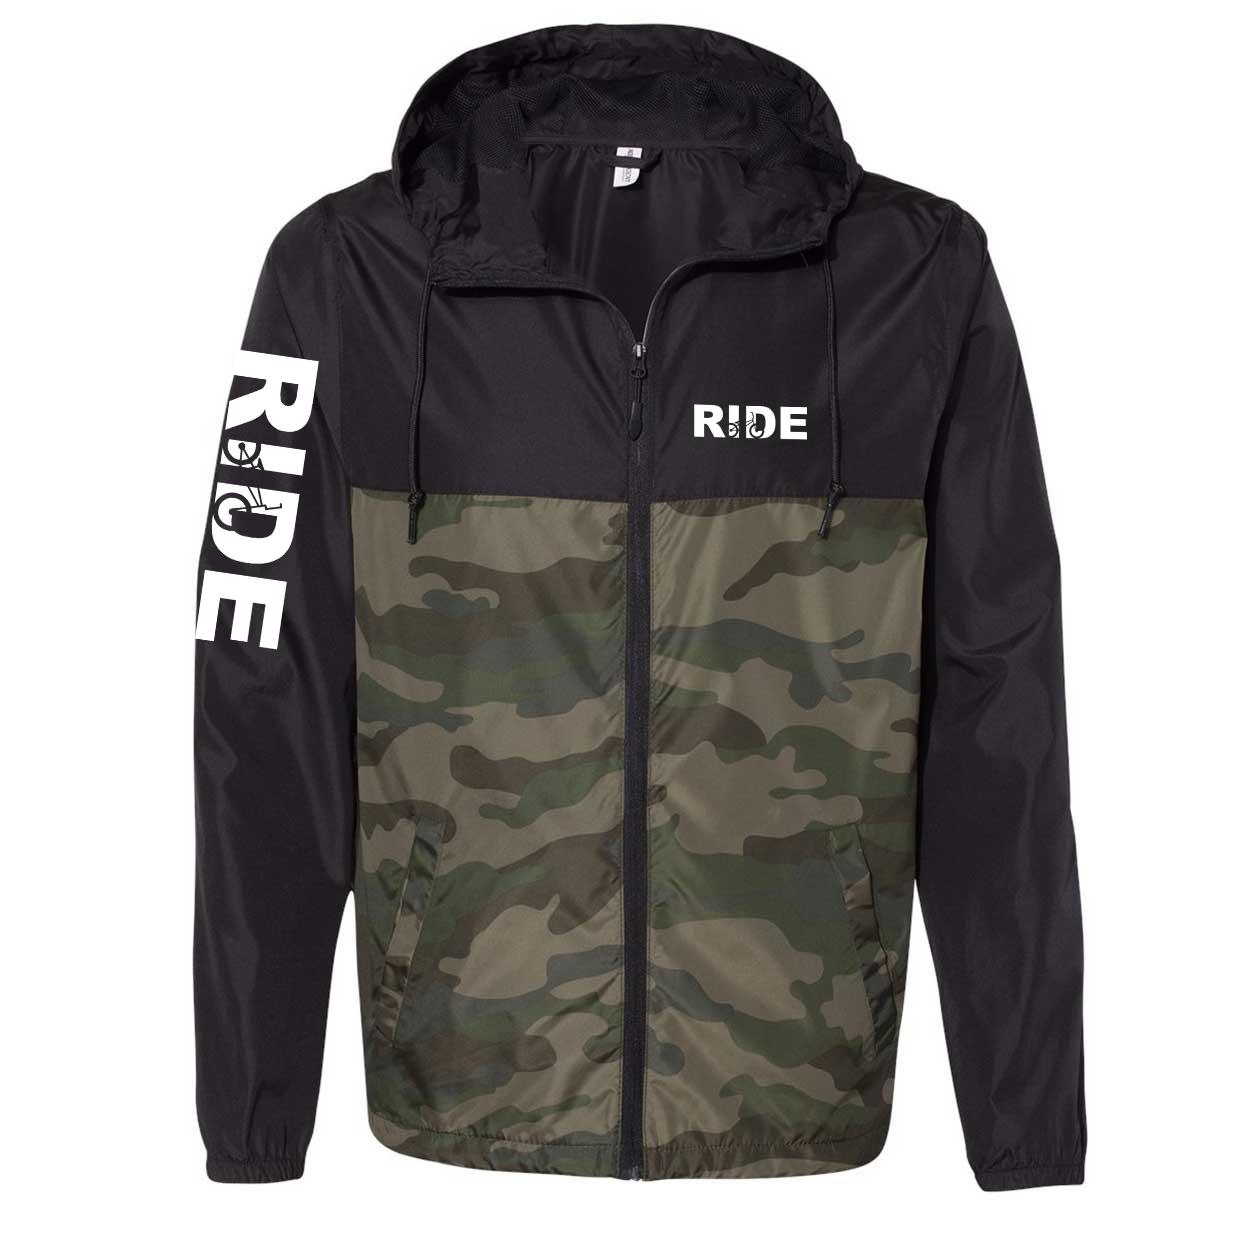 Ride BMX Logo Classic Lightweight Windbreaker Black/Forest Camo (White Logo)